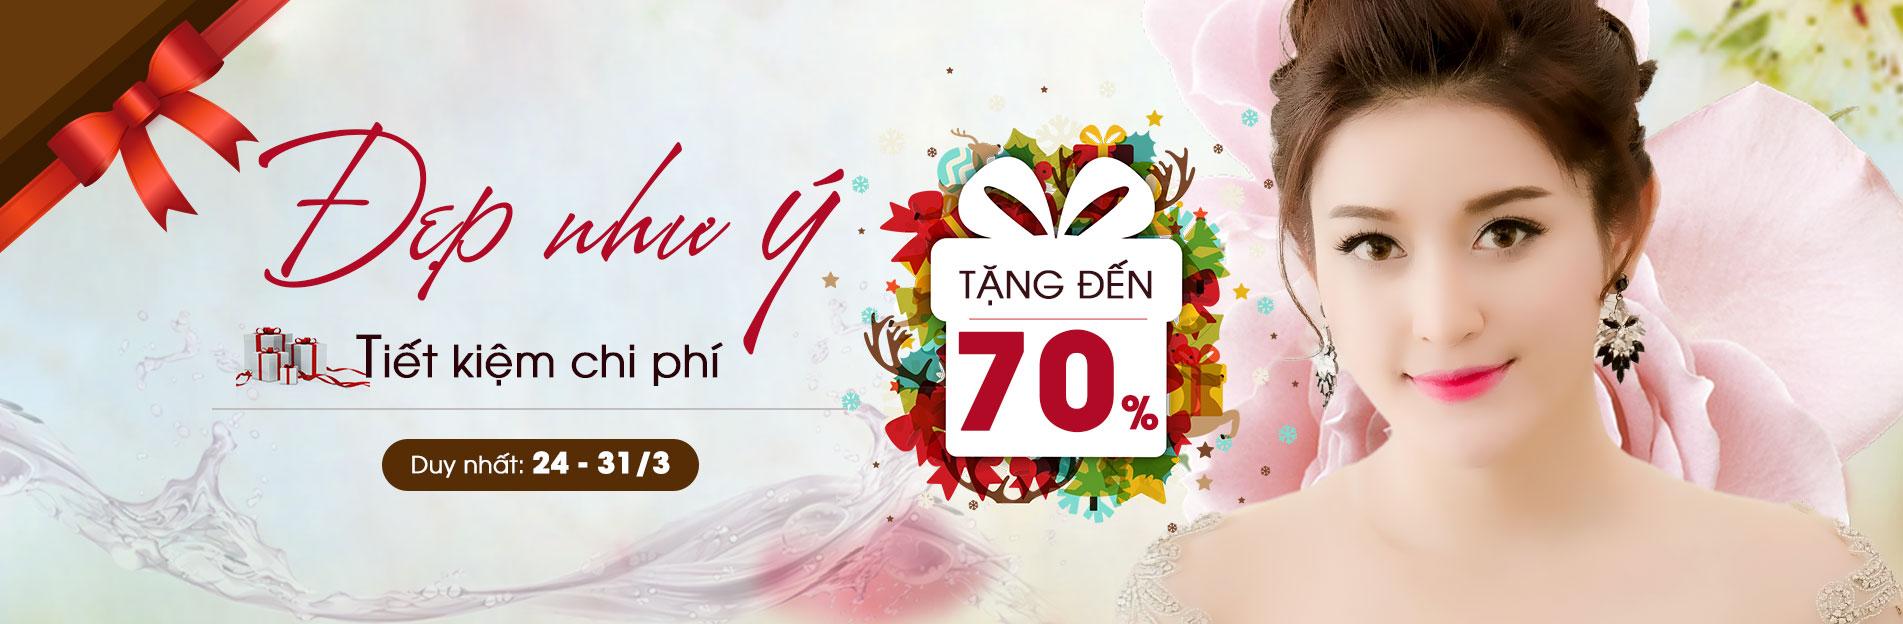 Banner tong thang 2-2017